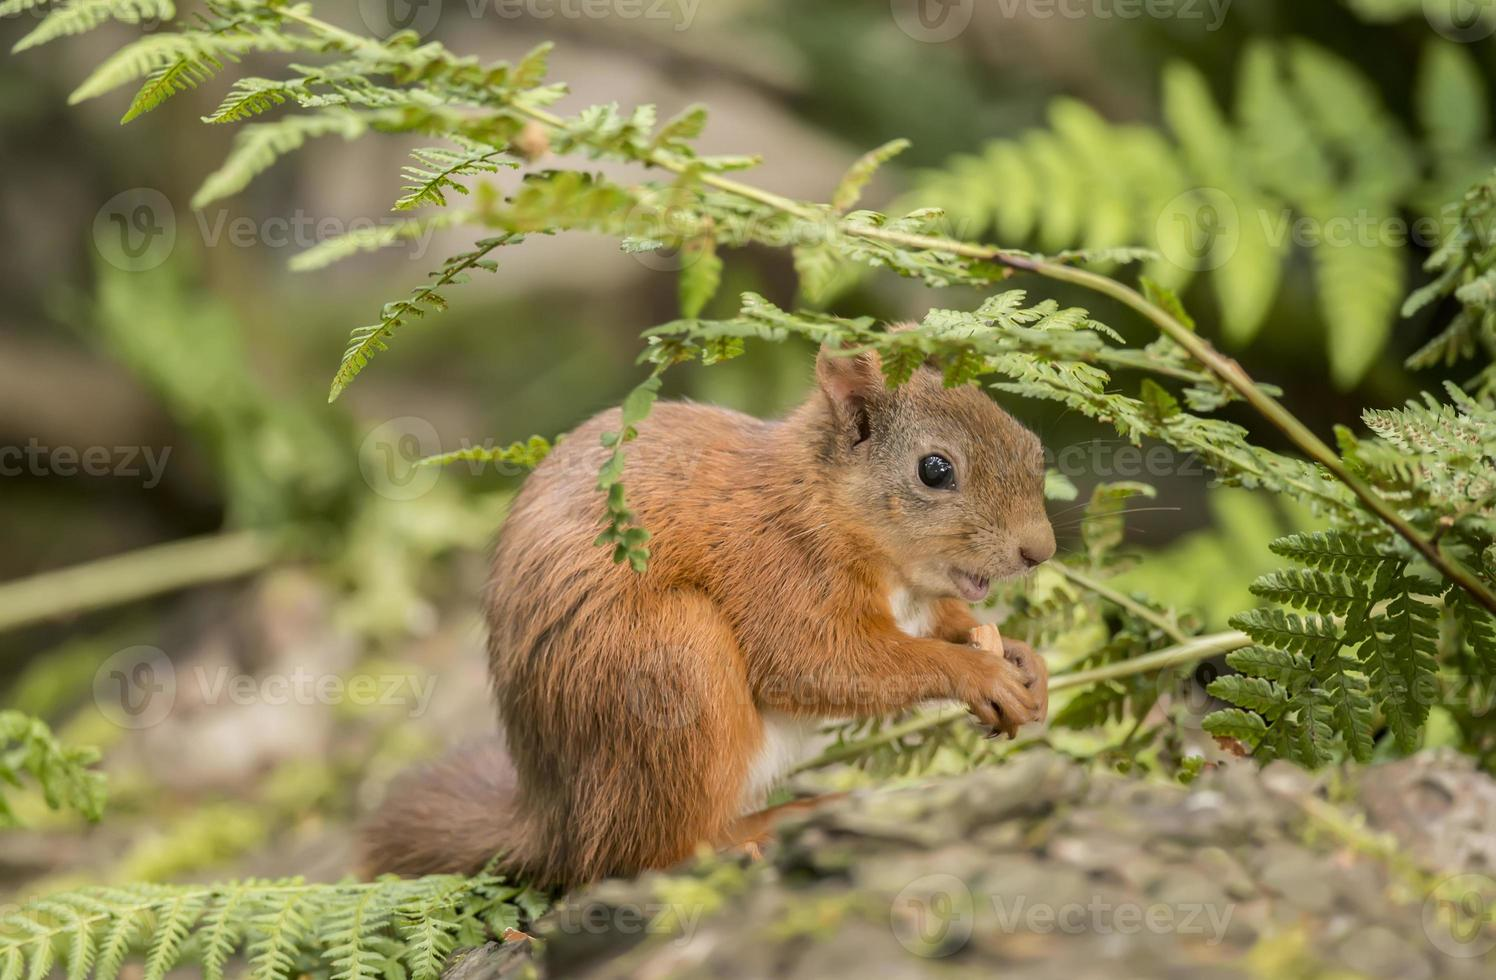 röd ekorre på en trädstam som äter en mutter foto